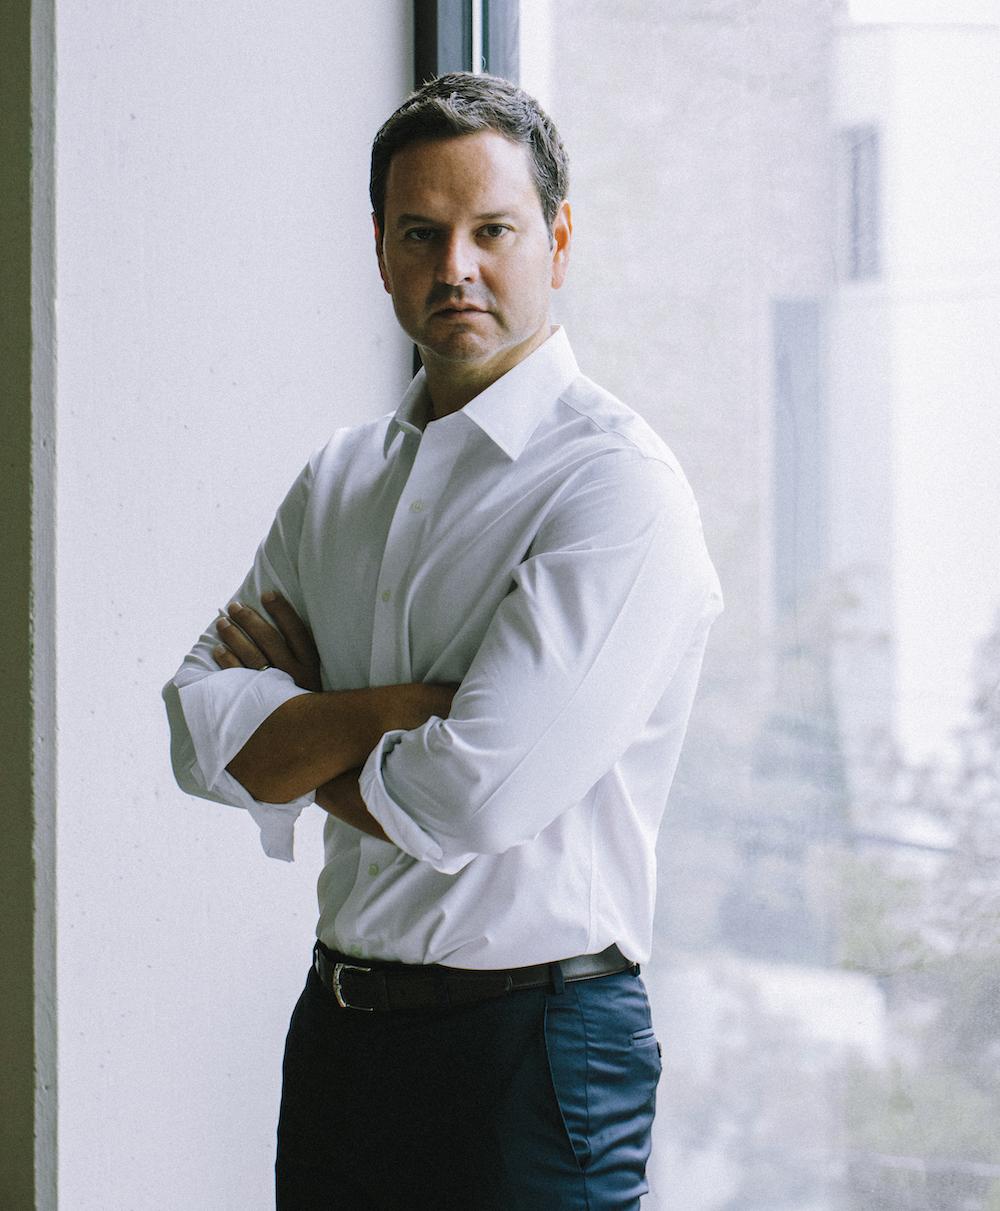 Carlos Rousseau